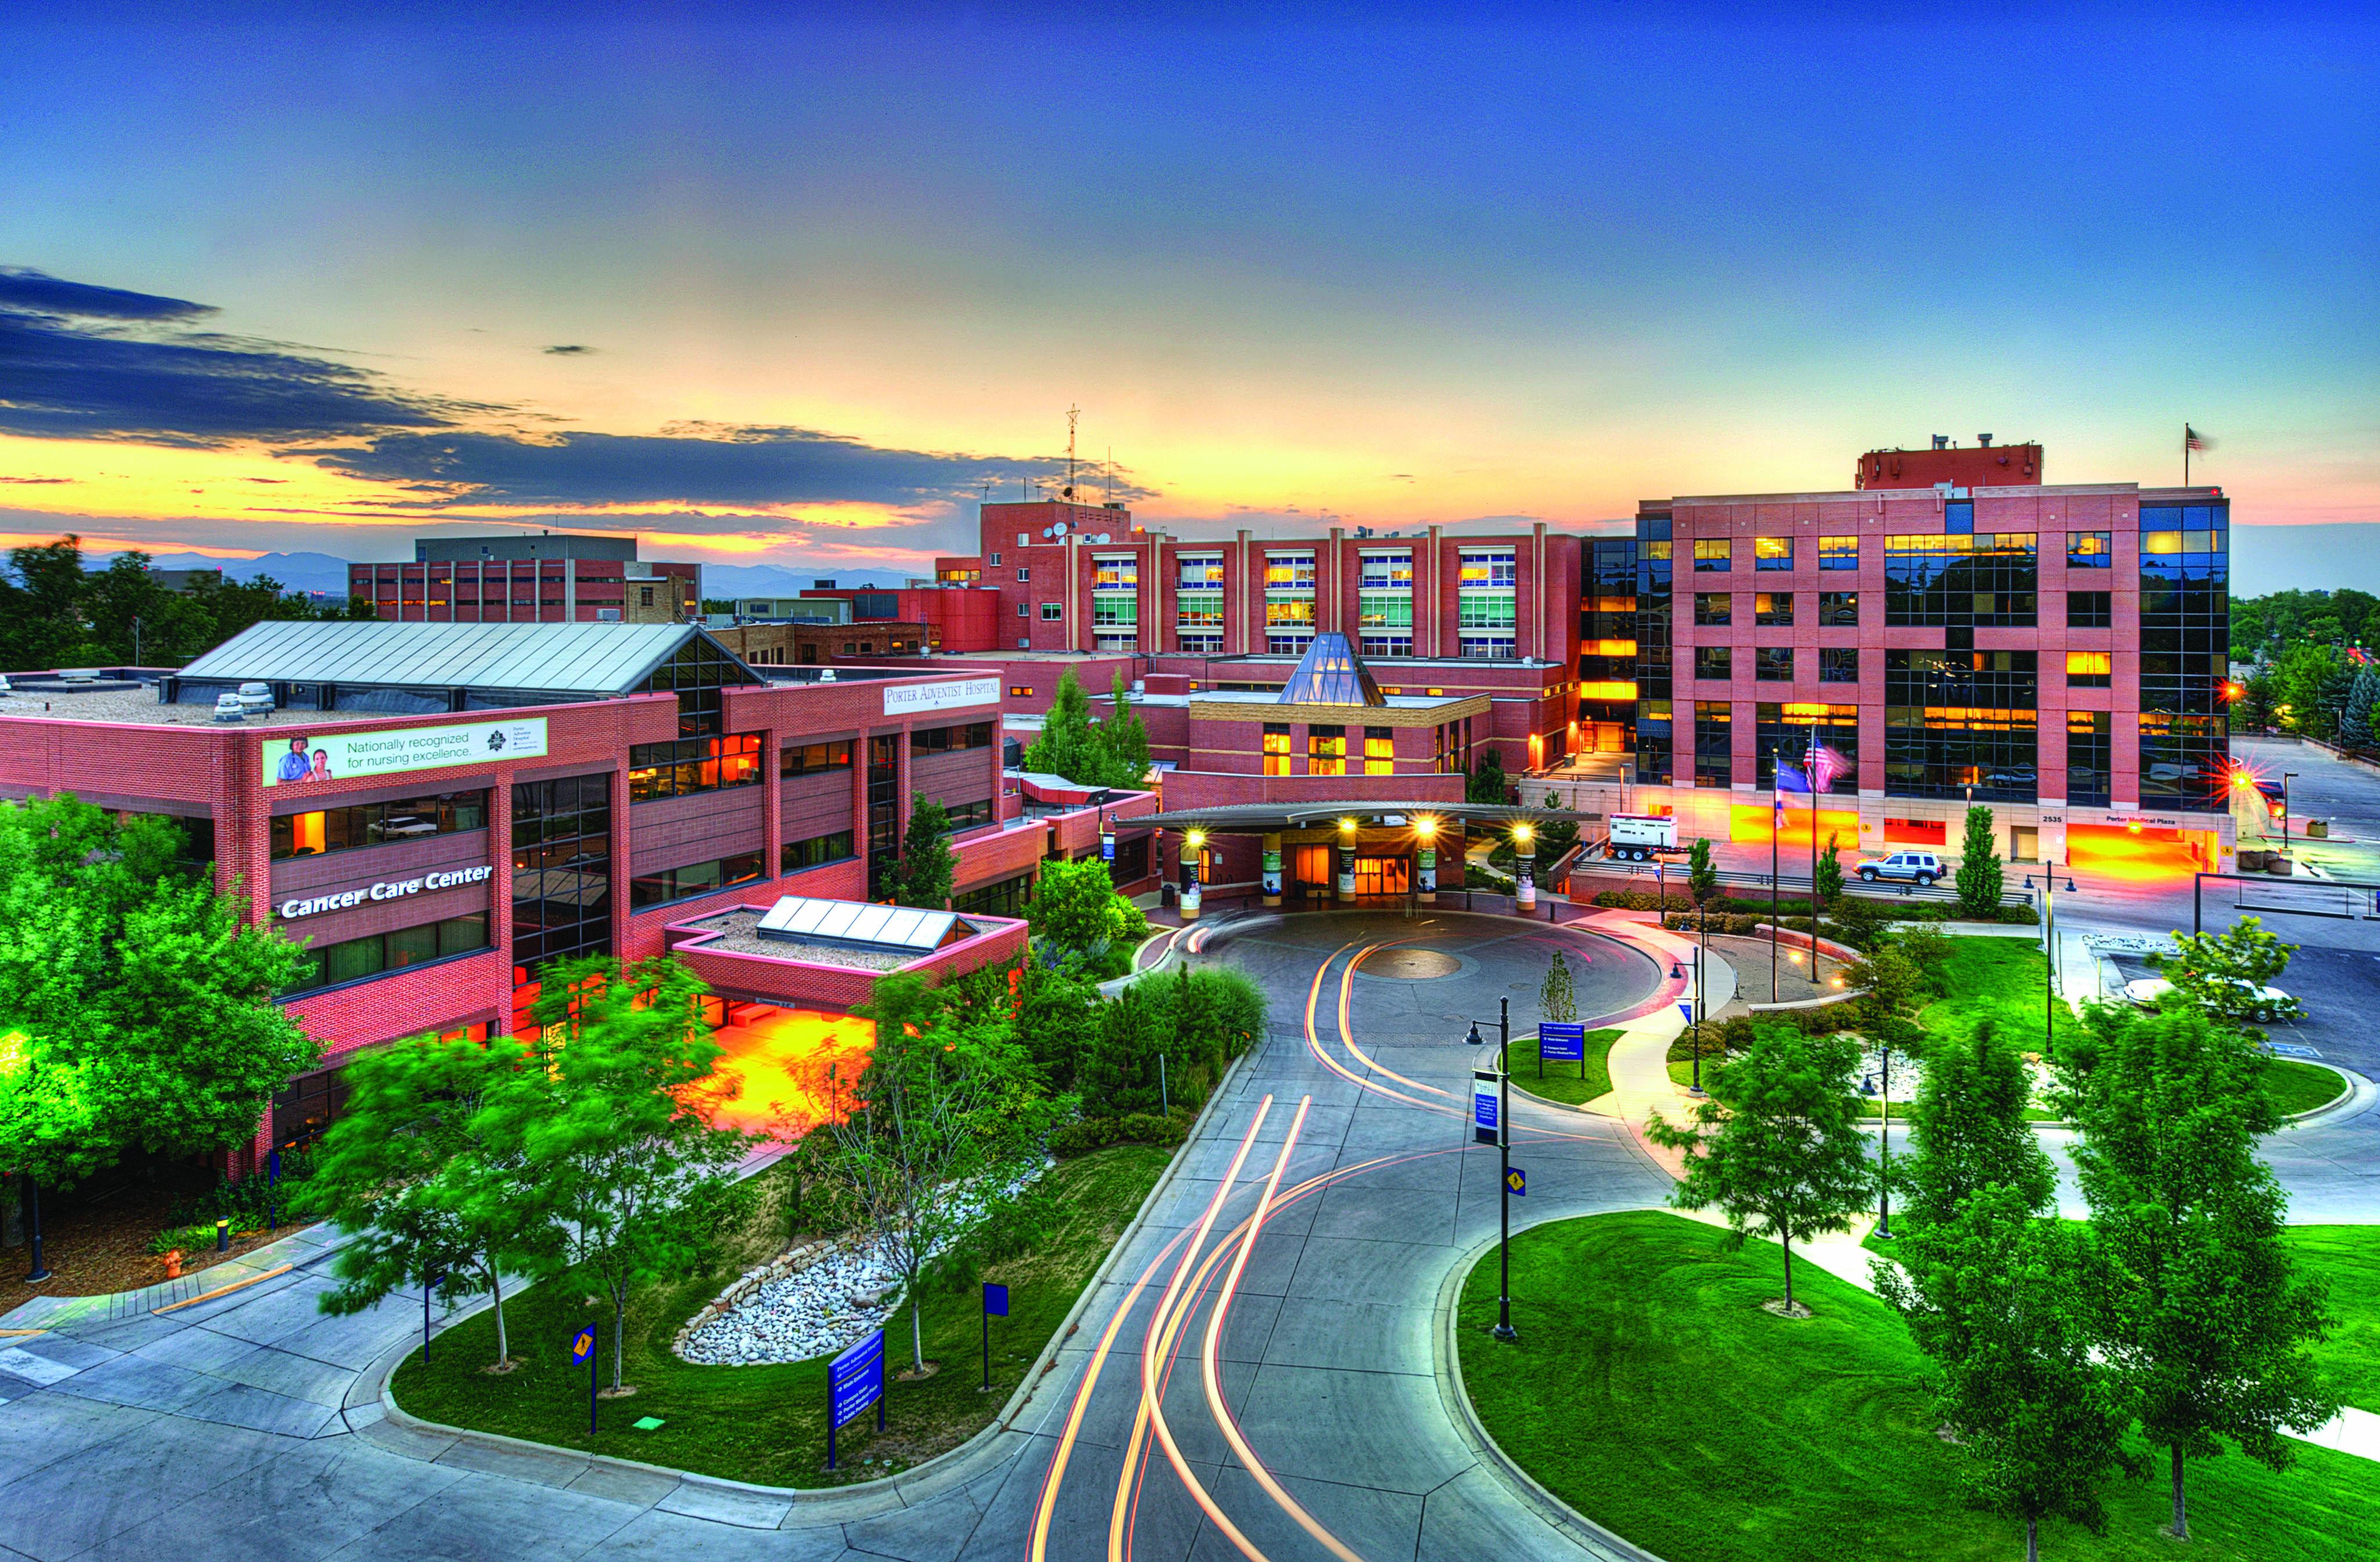 centurahealth-porter hospital